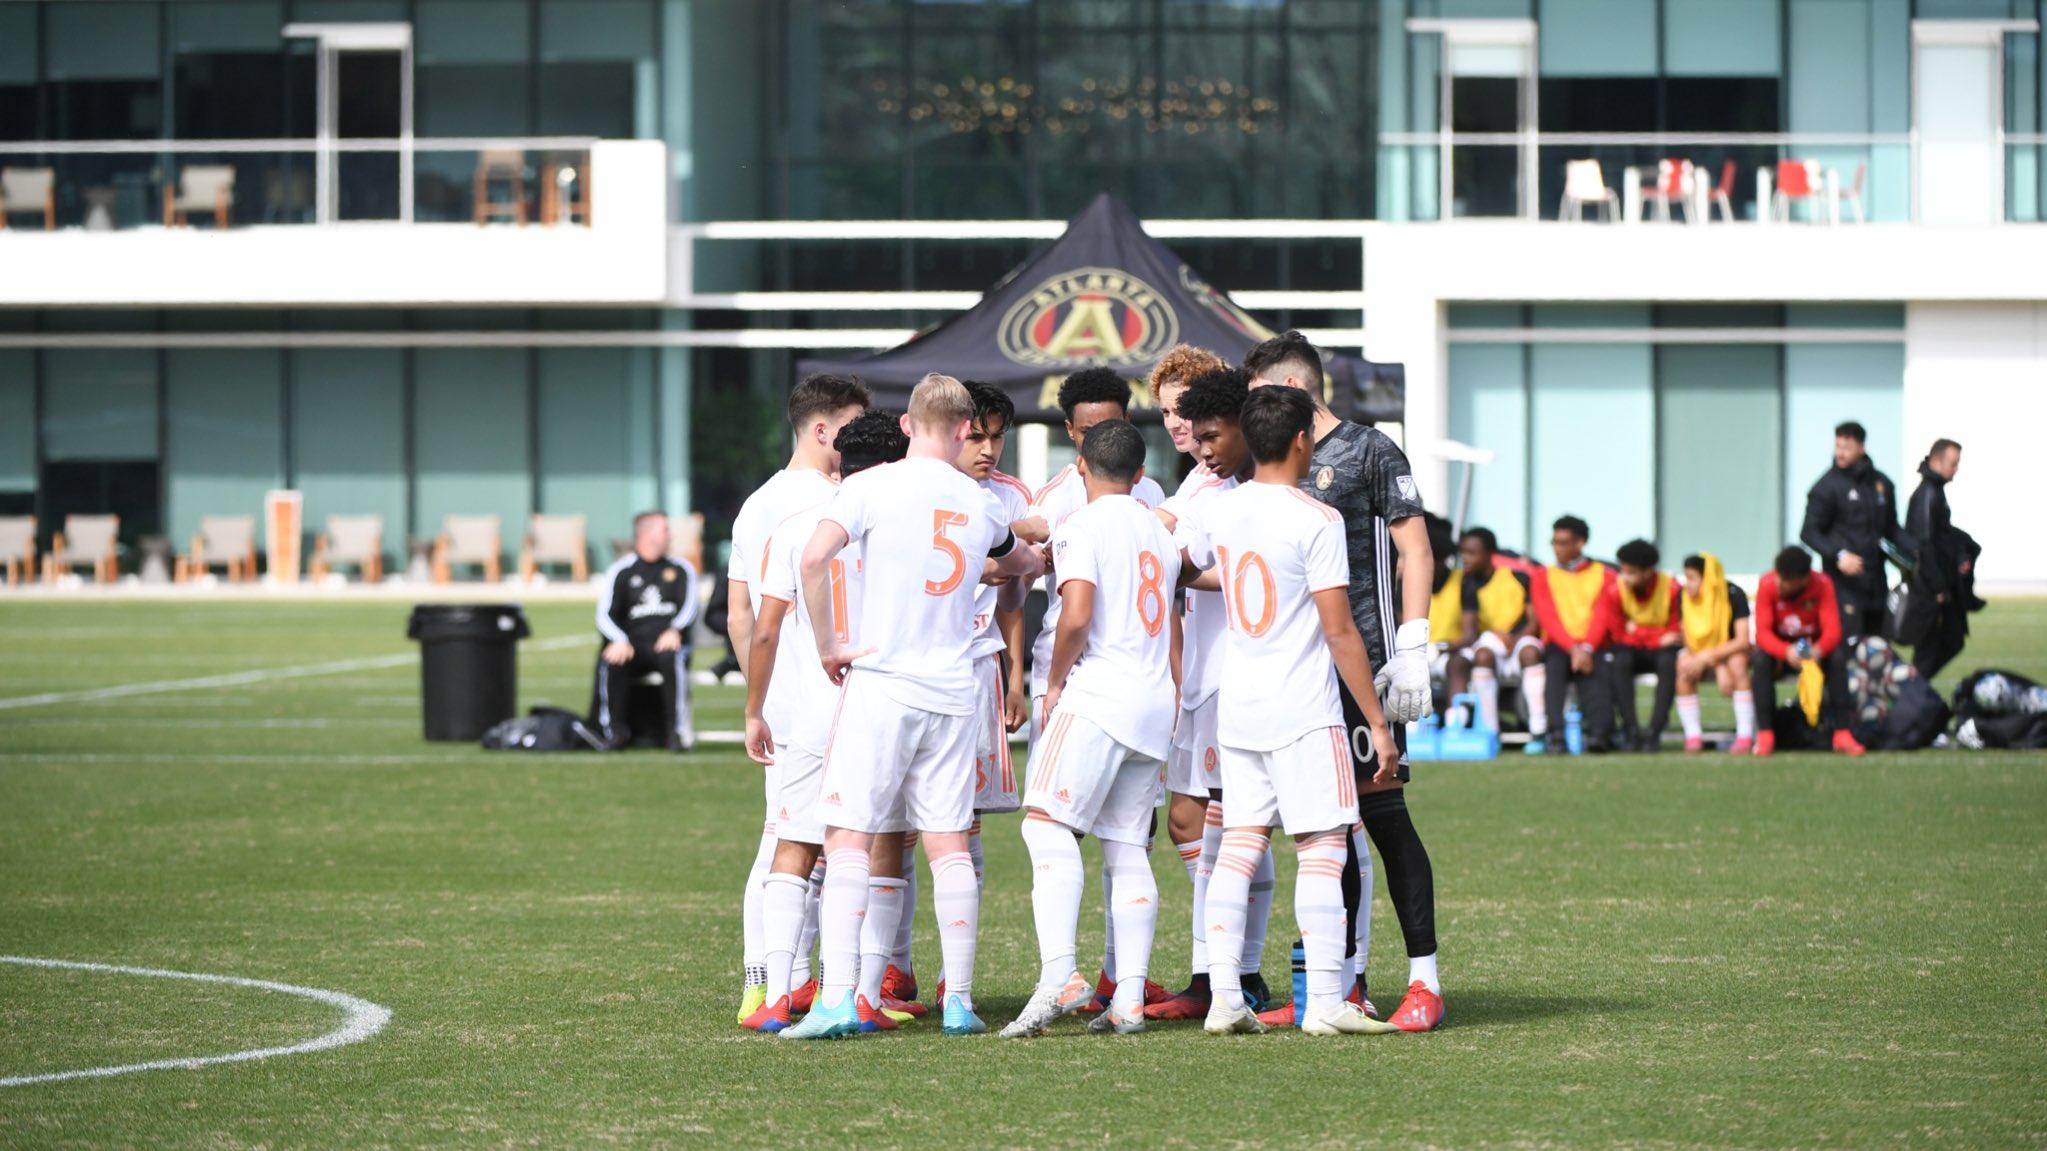 Mls Program Atlanta United Academy Joins Ecnl Boys Soccerwire